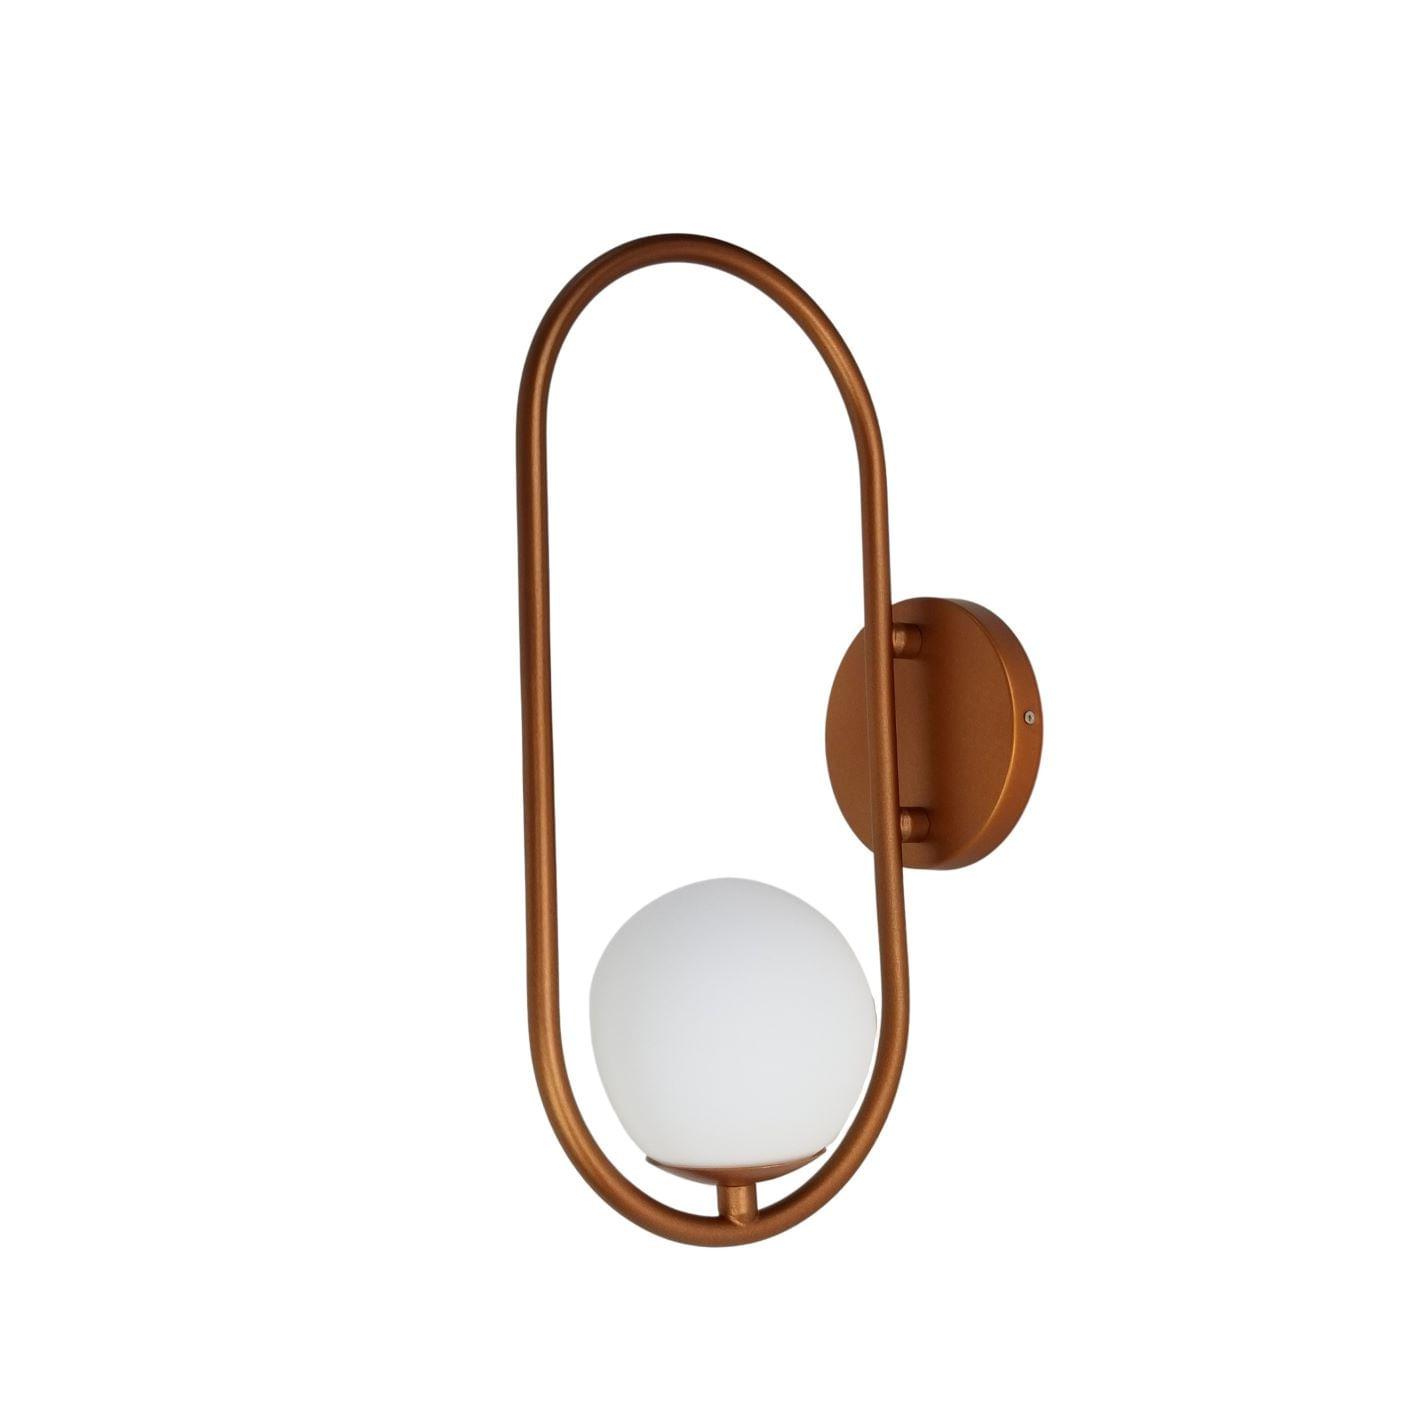 Arandela Moderna Aro Oval Cobre Com Globo Branco 12cm